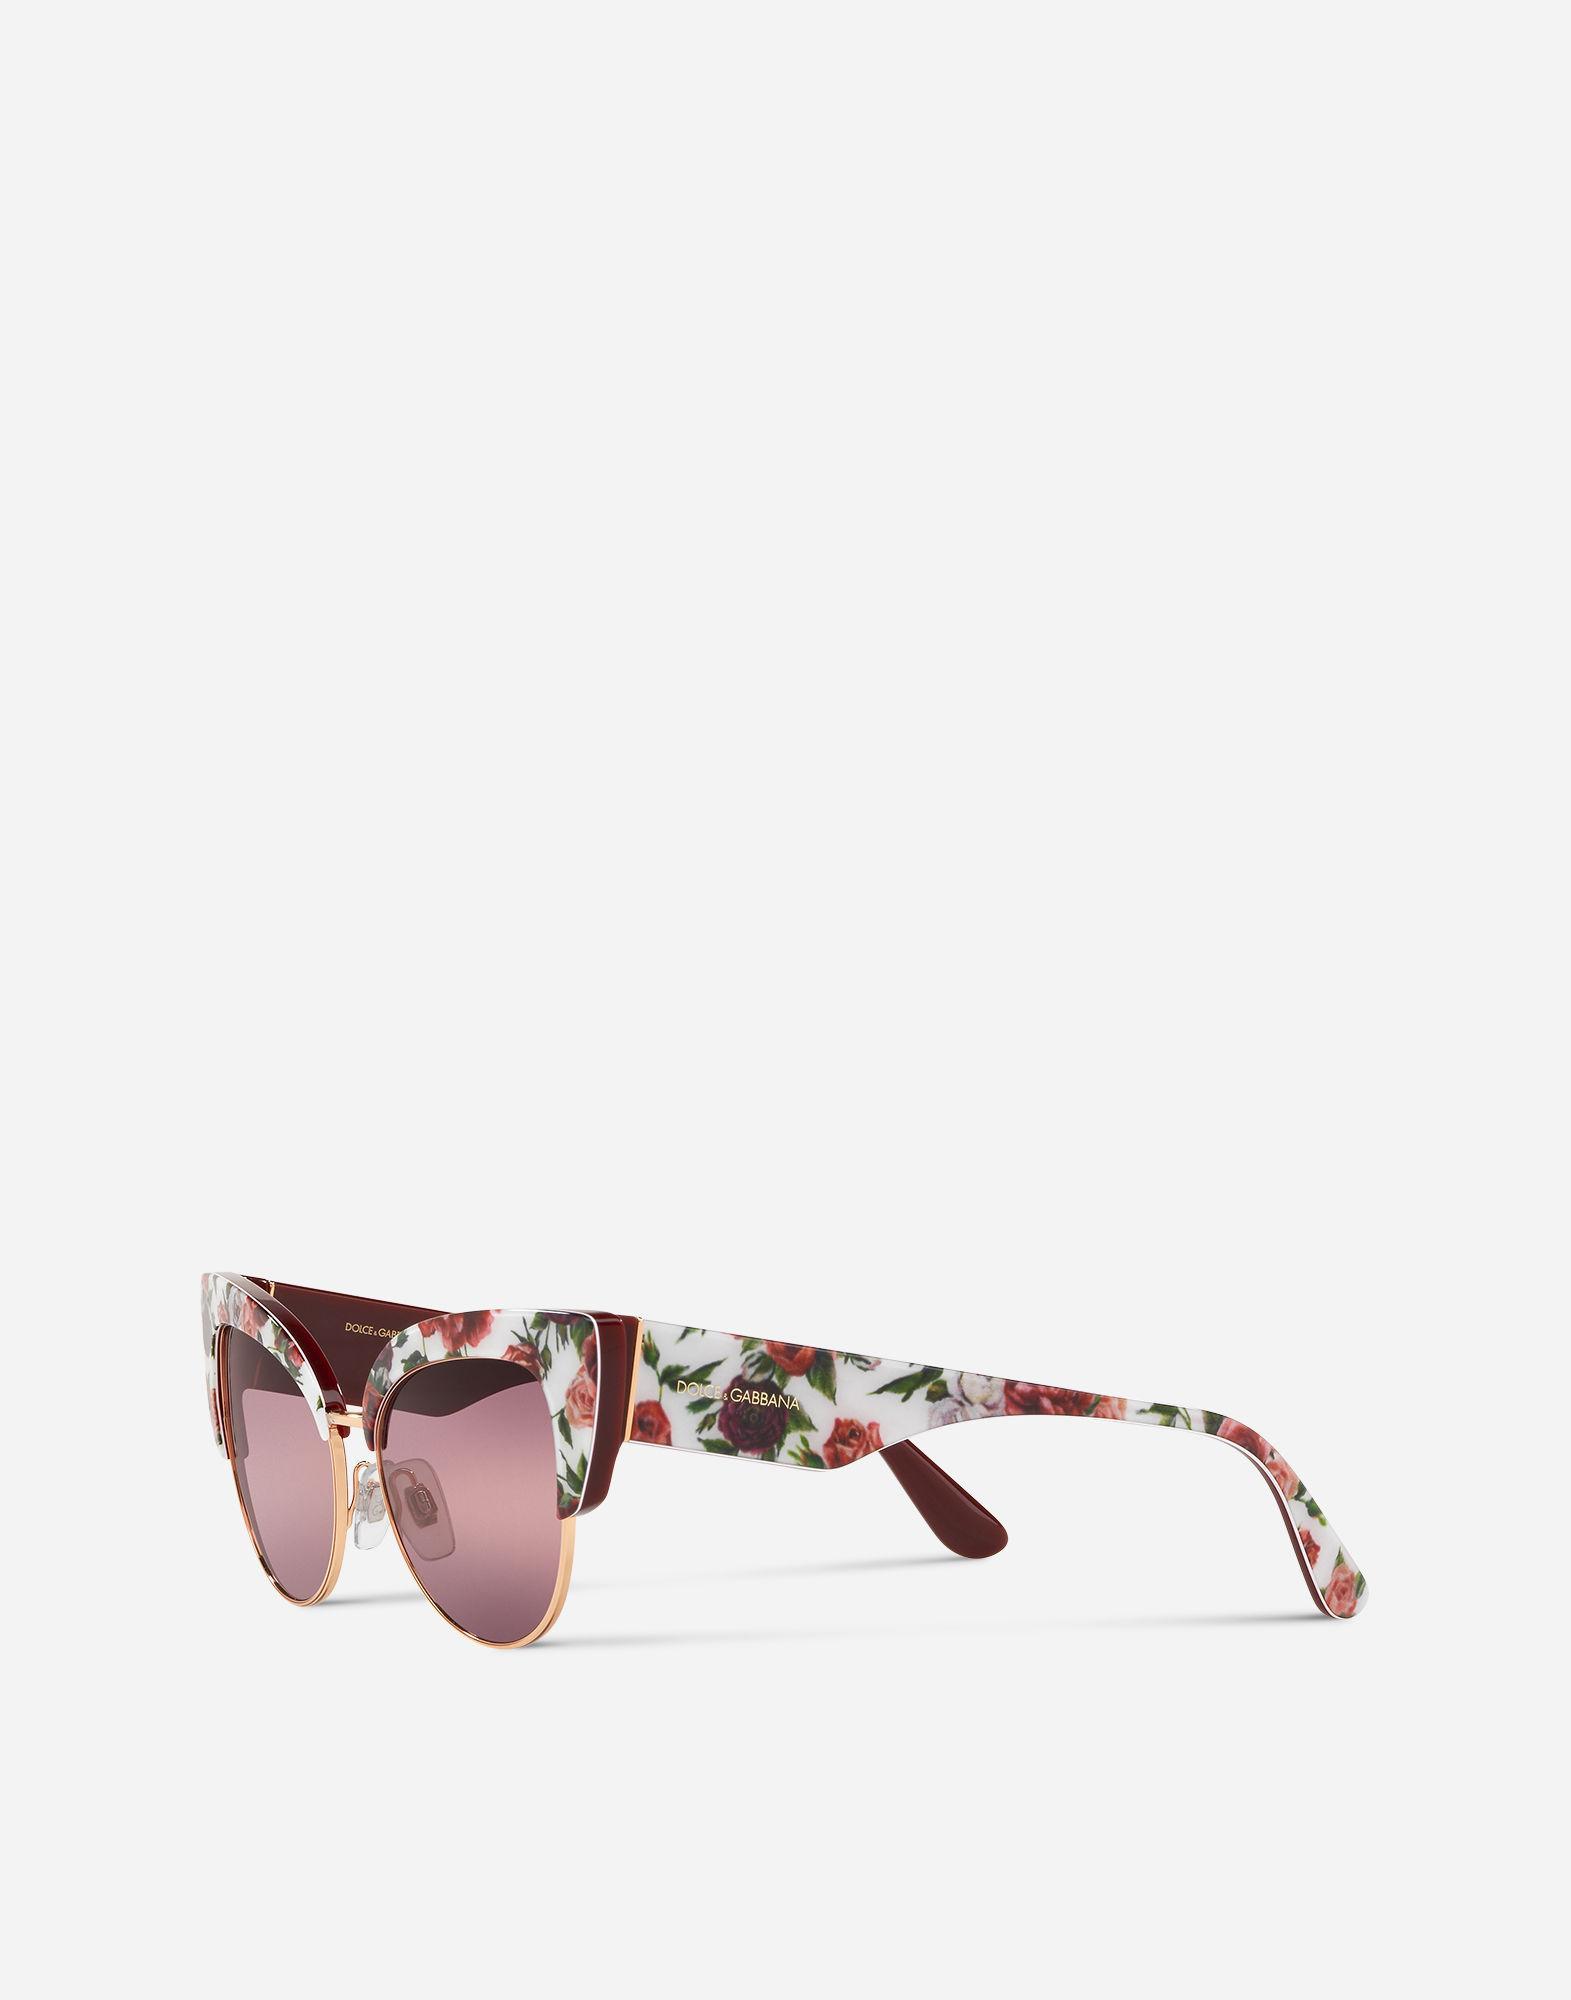 55511593cc99 Lyst - Dolce   Gabbana Print Family Sunglasses